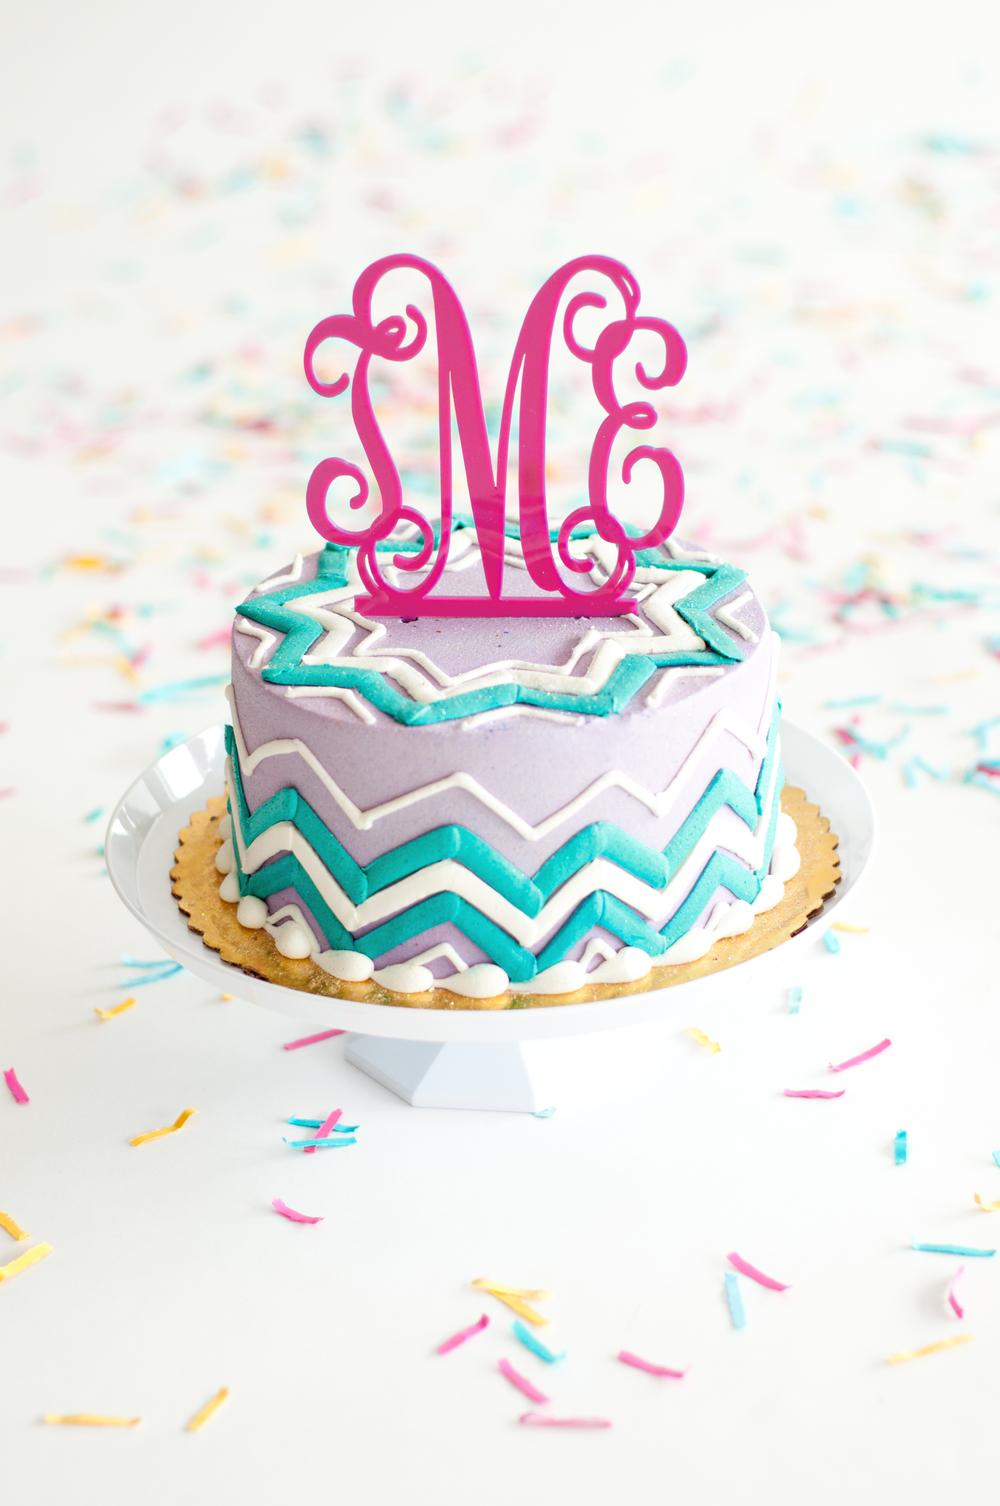 Cake Topper Pink.jpg